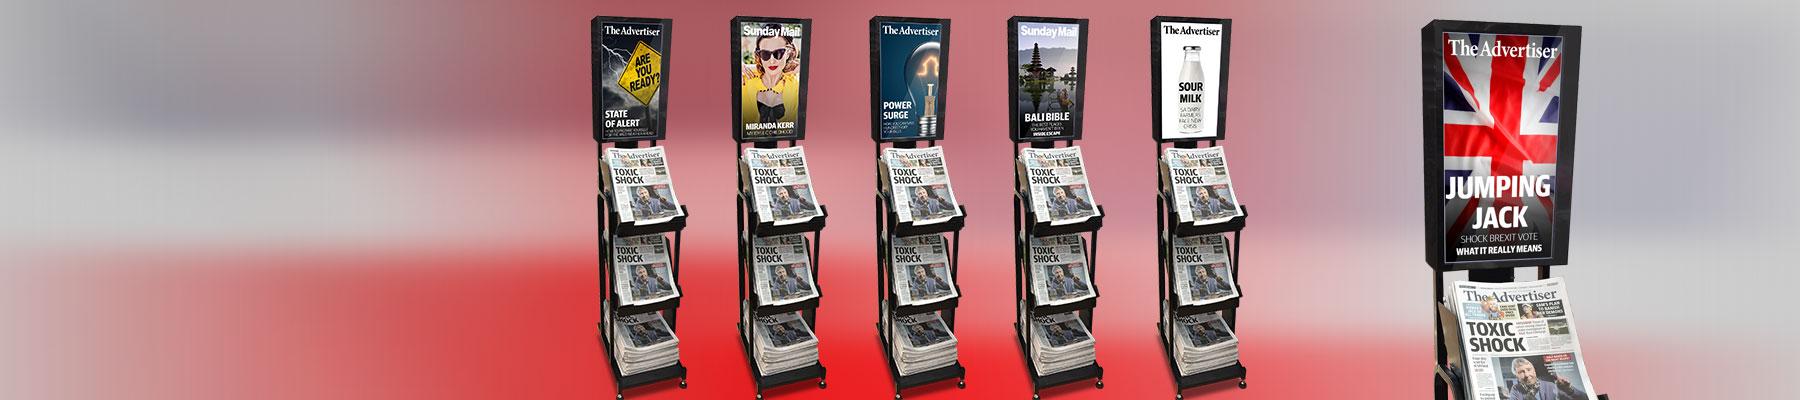 News Corp Australia's Digital Retail Impulse Stands